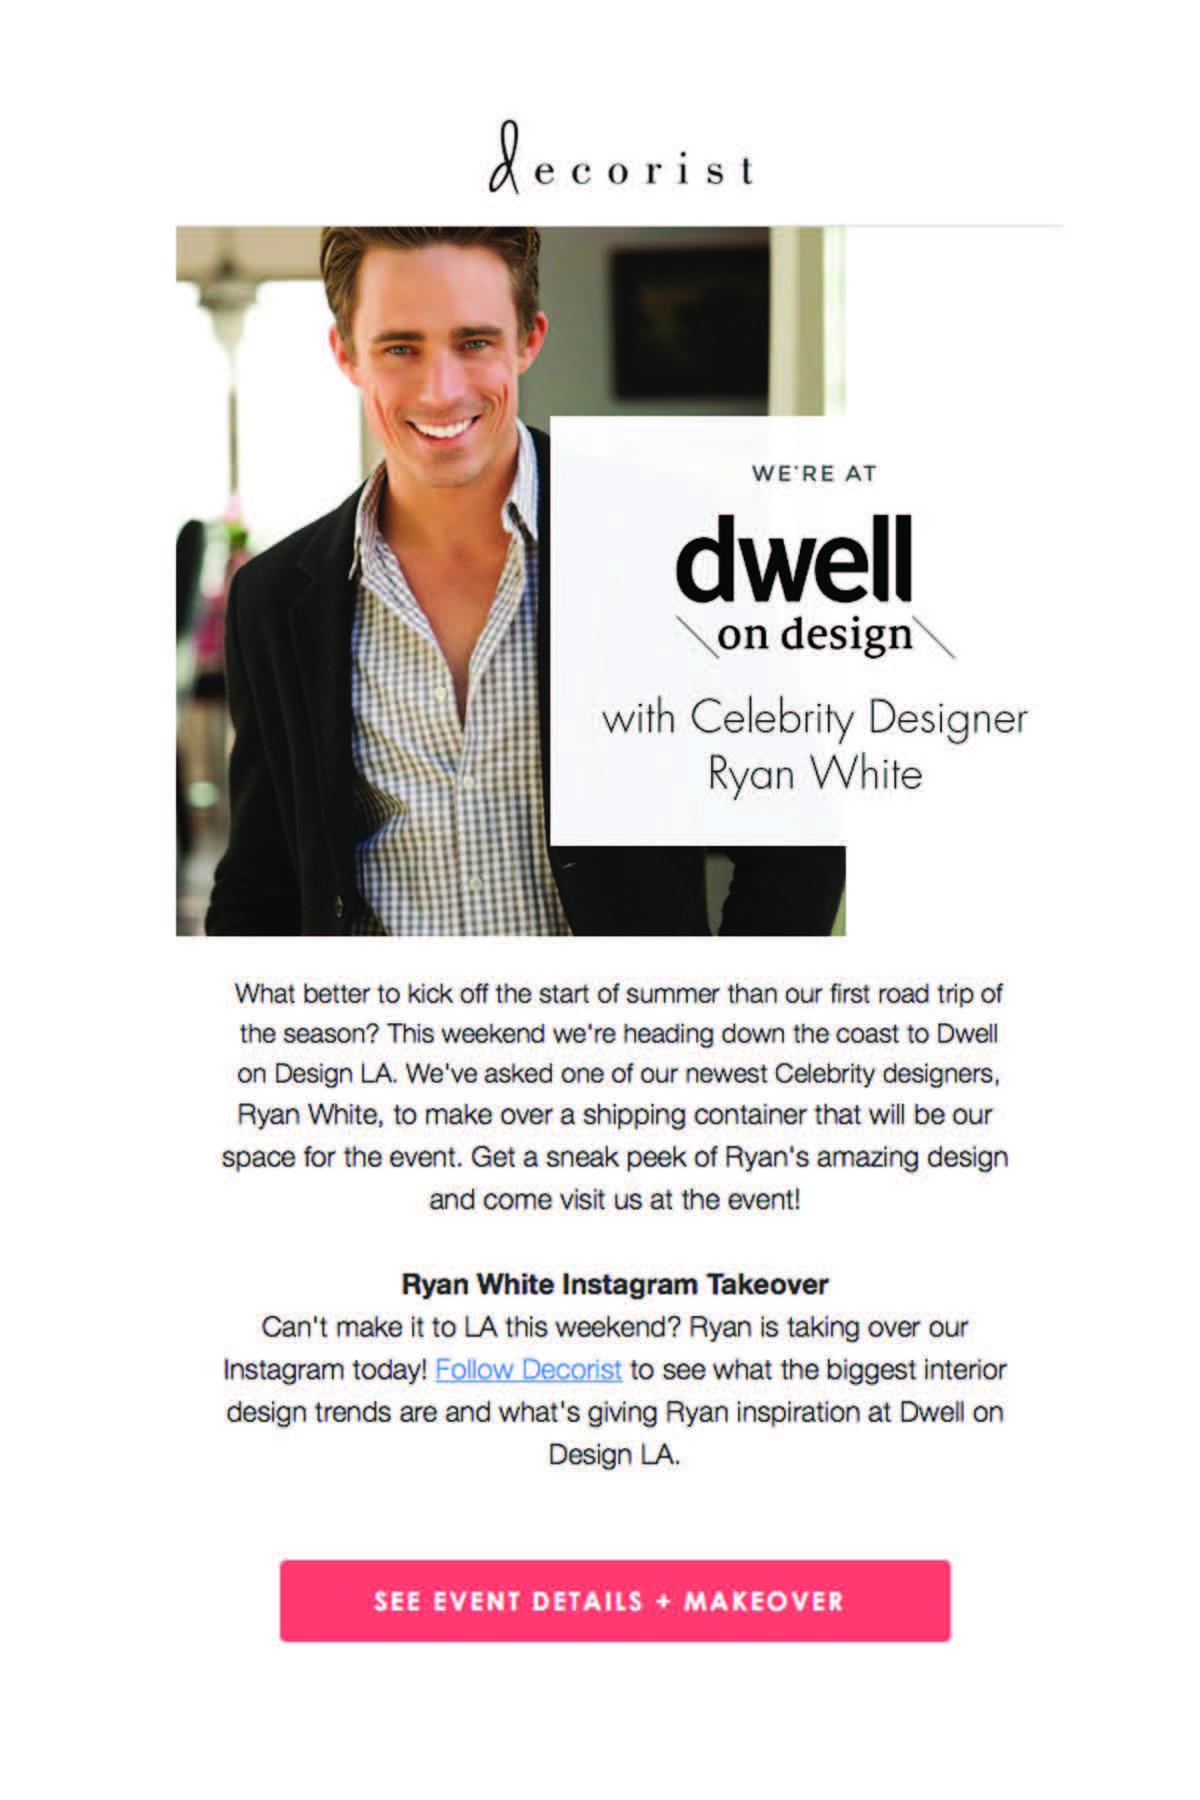 RWD w/ Decorist for Dwell on Design LA